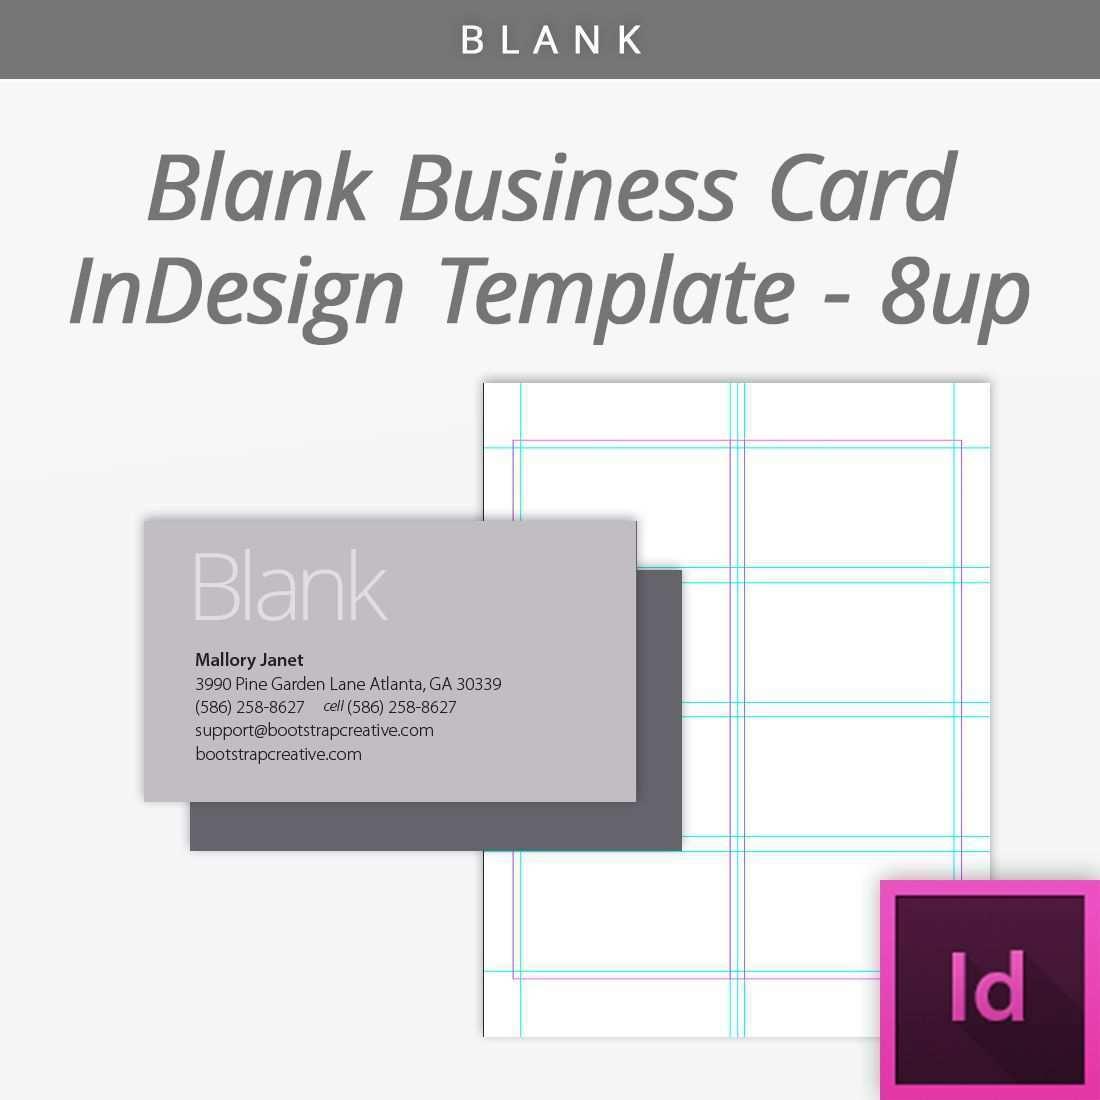 88 Blank Blank Business Card Template Illustrator Free Download Download by Blank Business Card Template Illustrator Free Download